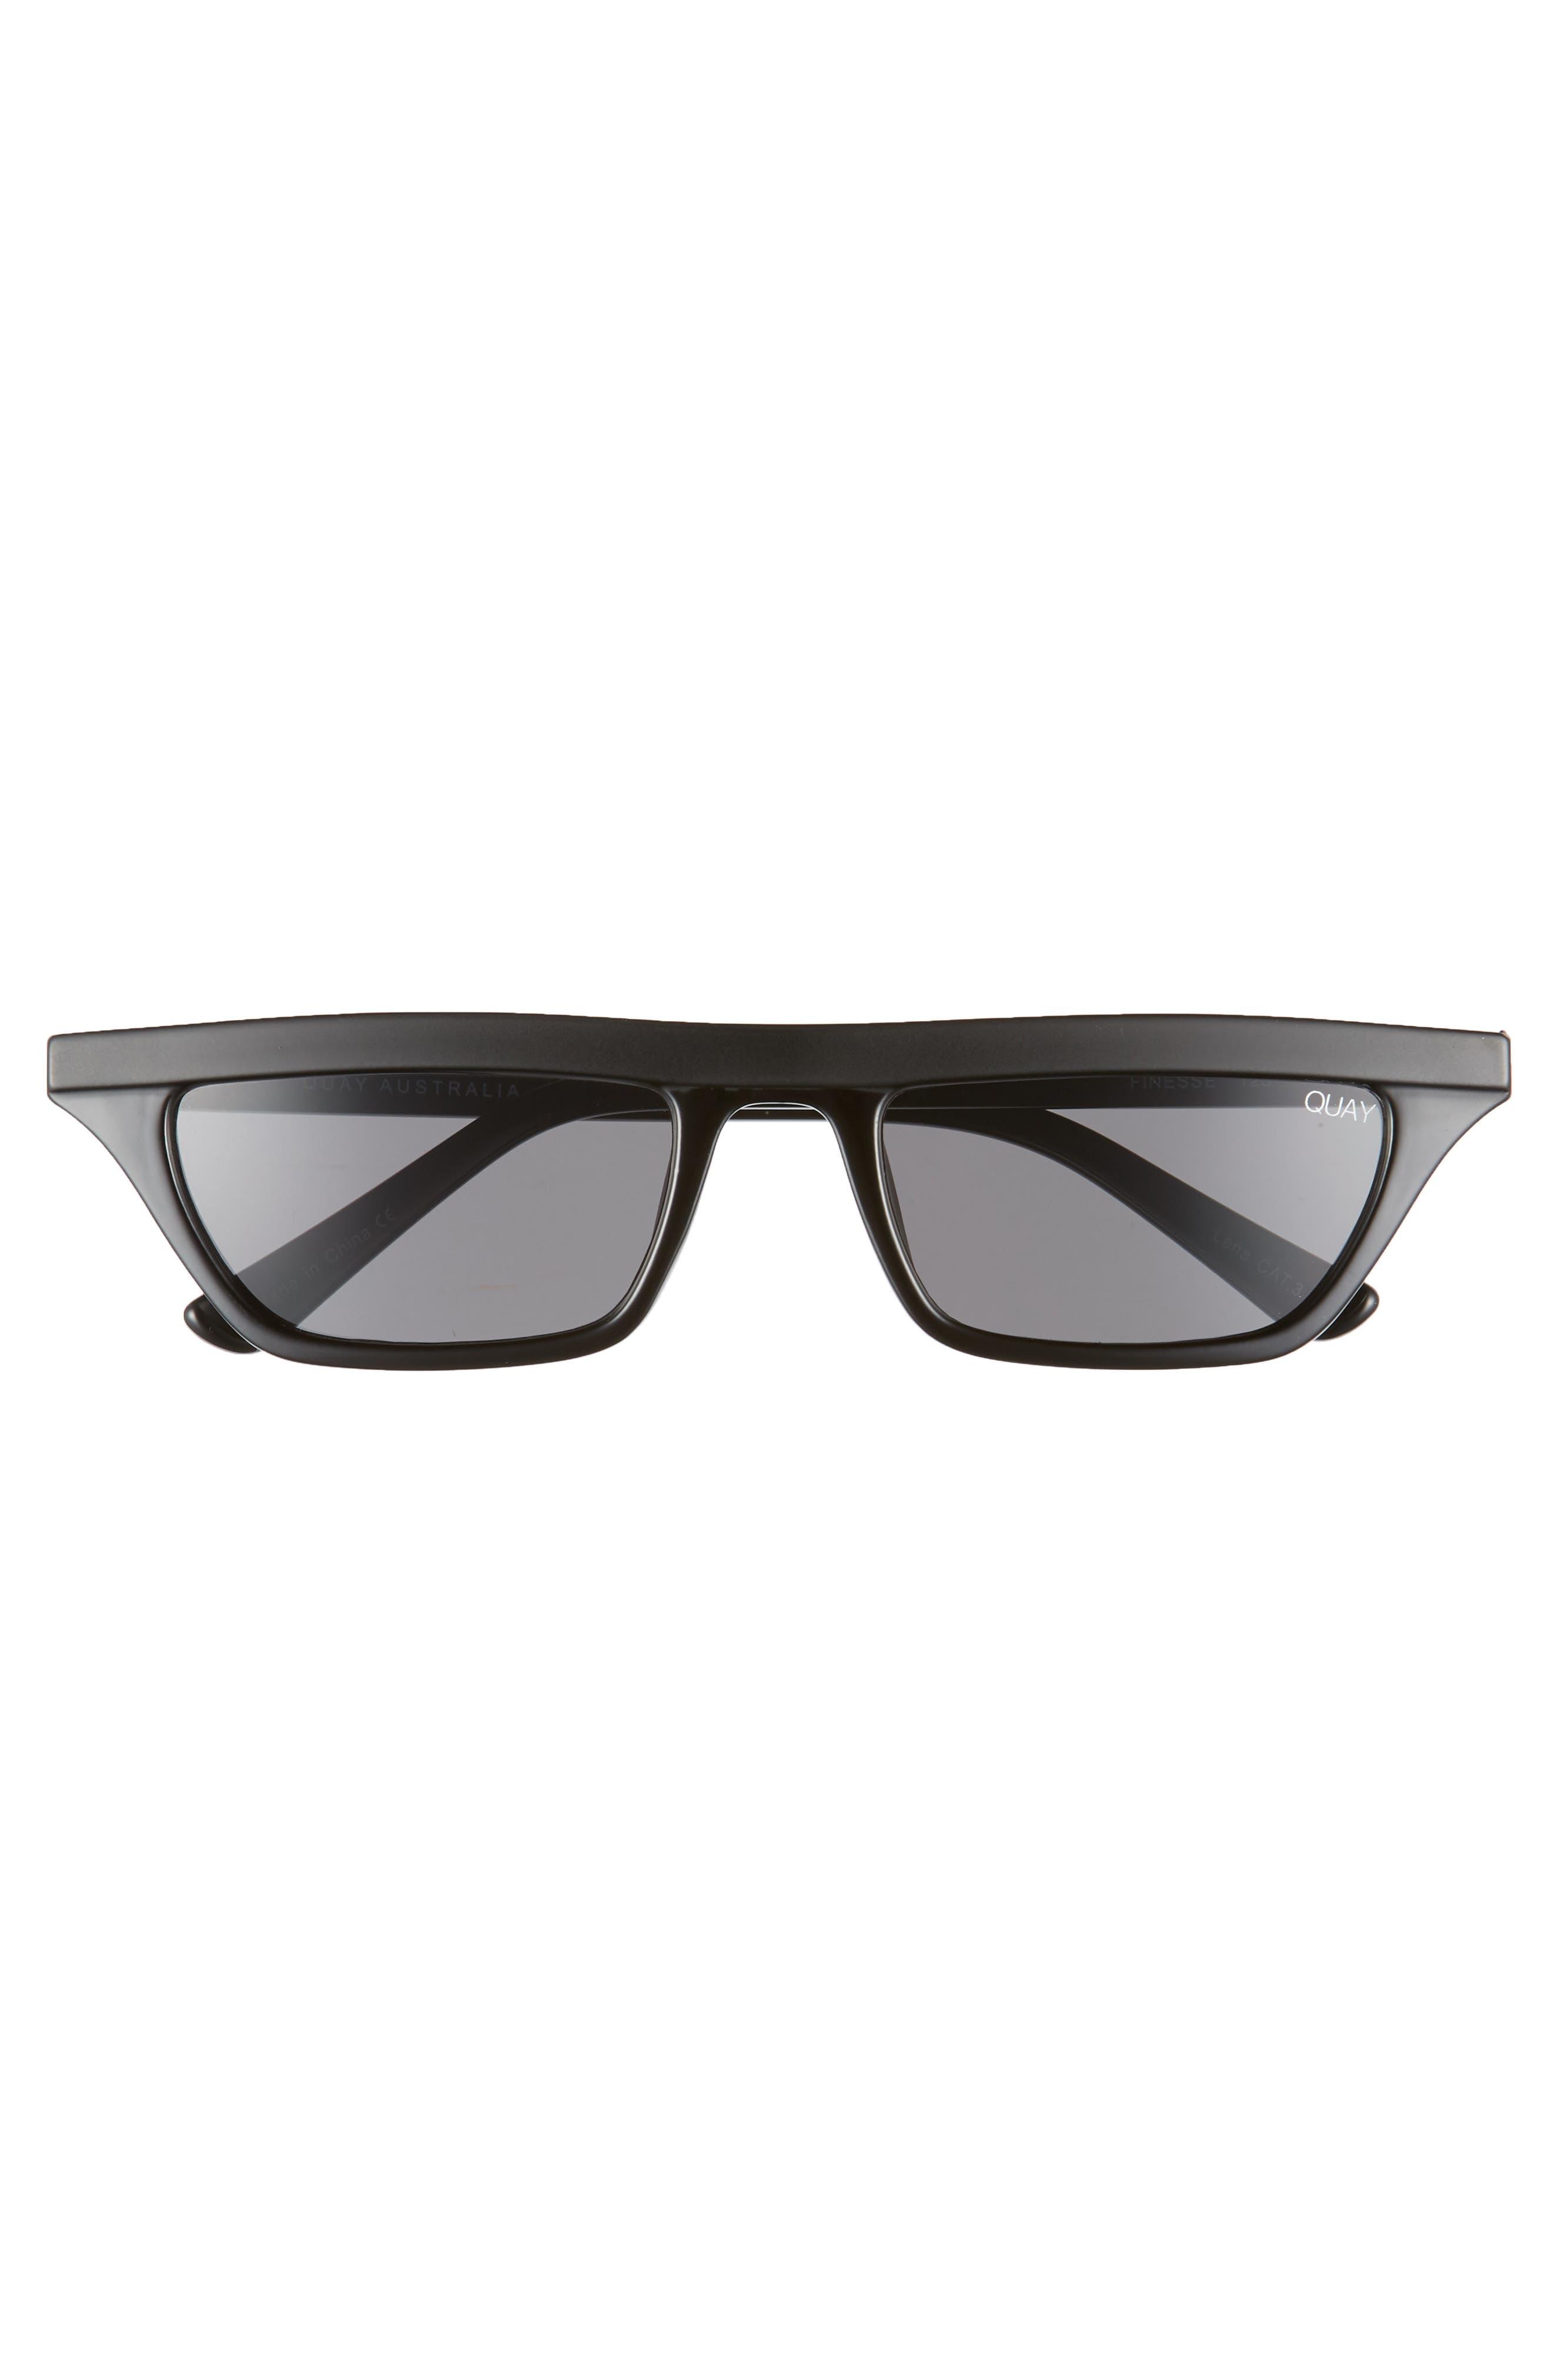 Finesse 52mm Sunglasses,                             Alternate thumbnail 3, color,                             BLACK/ SMOKE